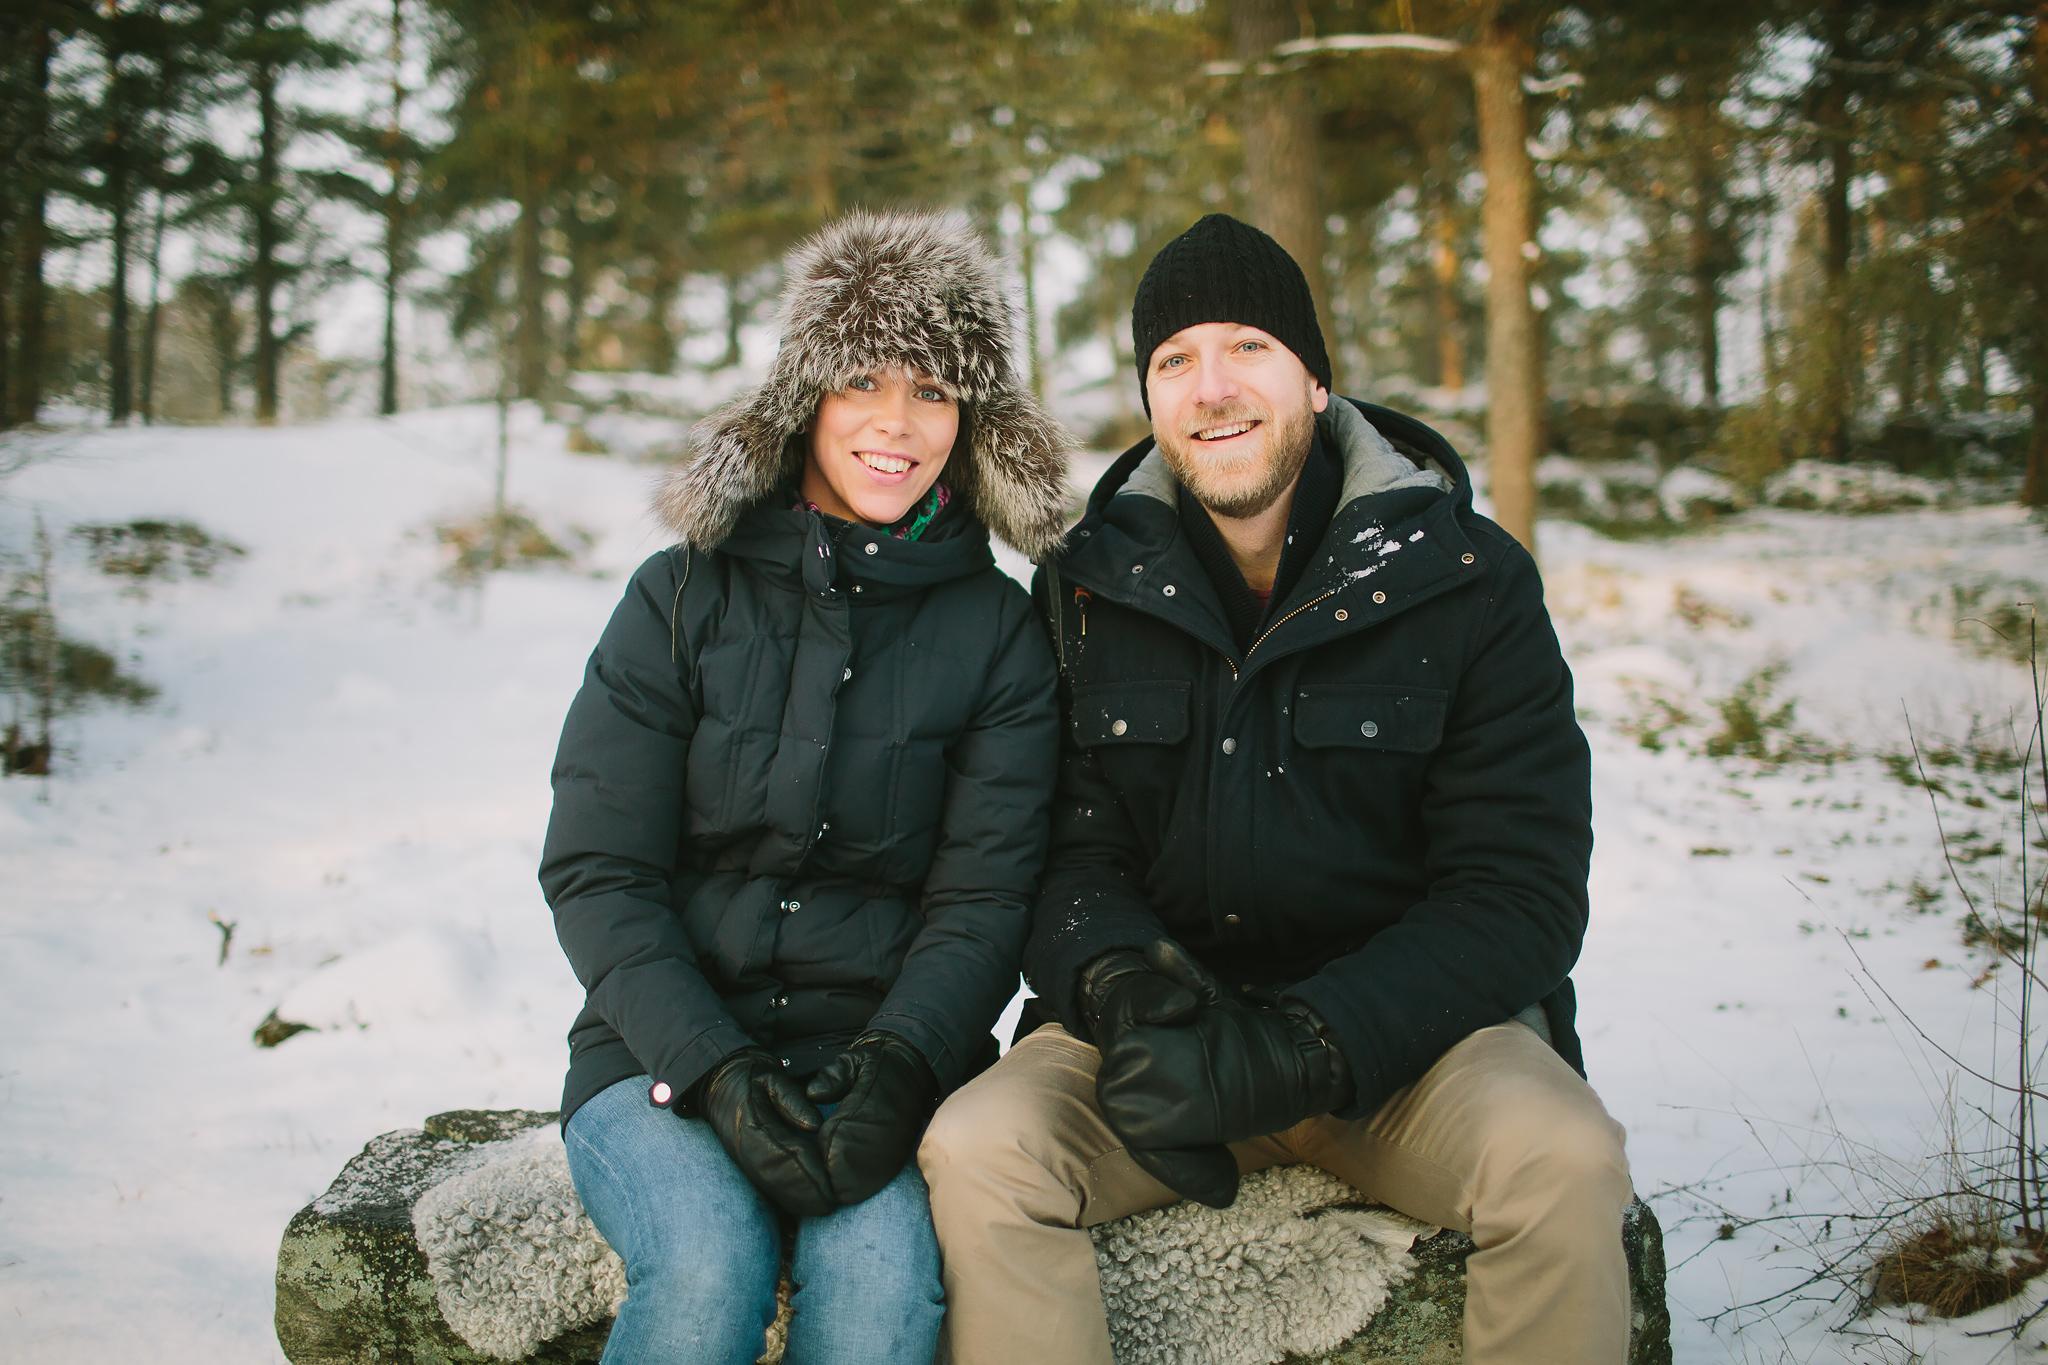 Parbilder på vintern